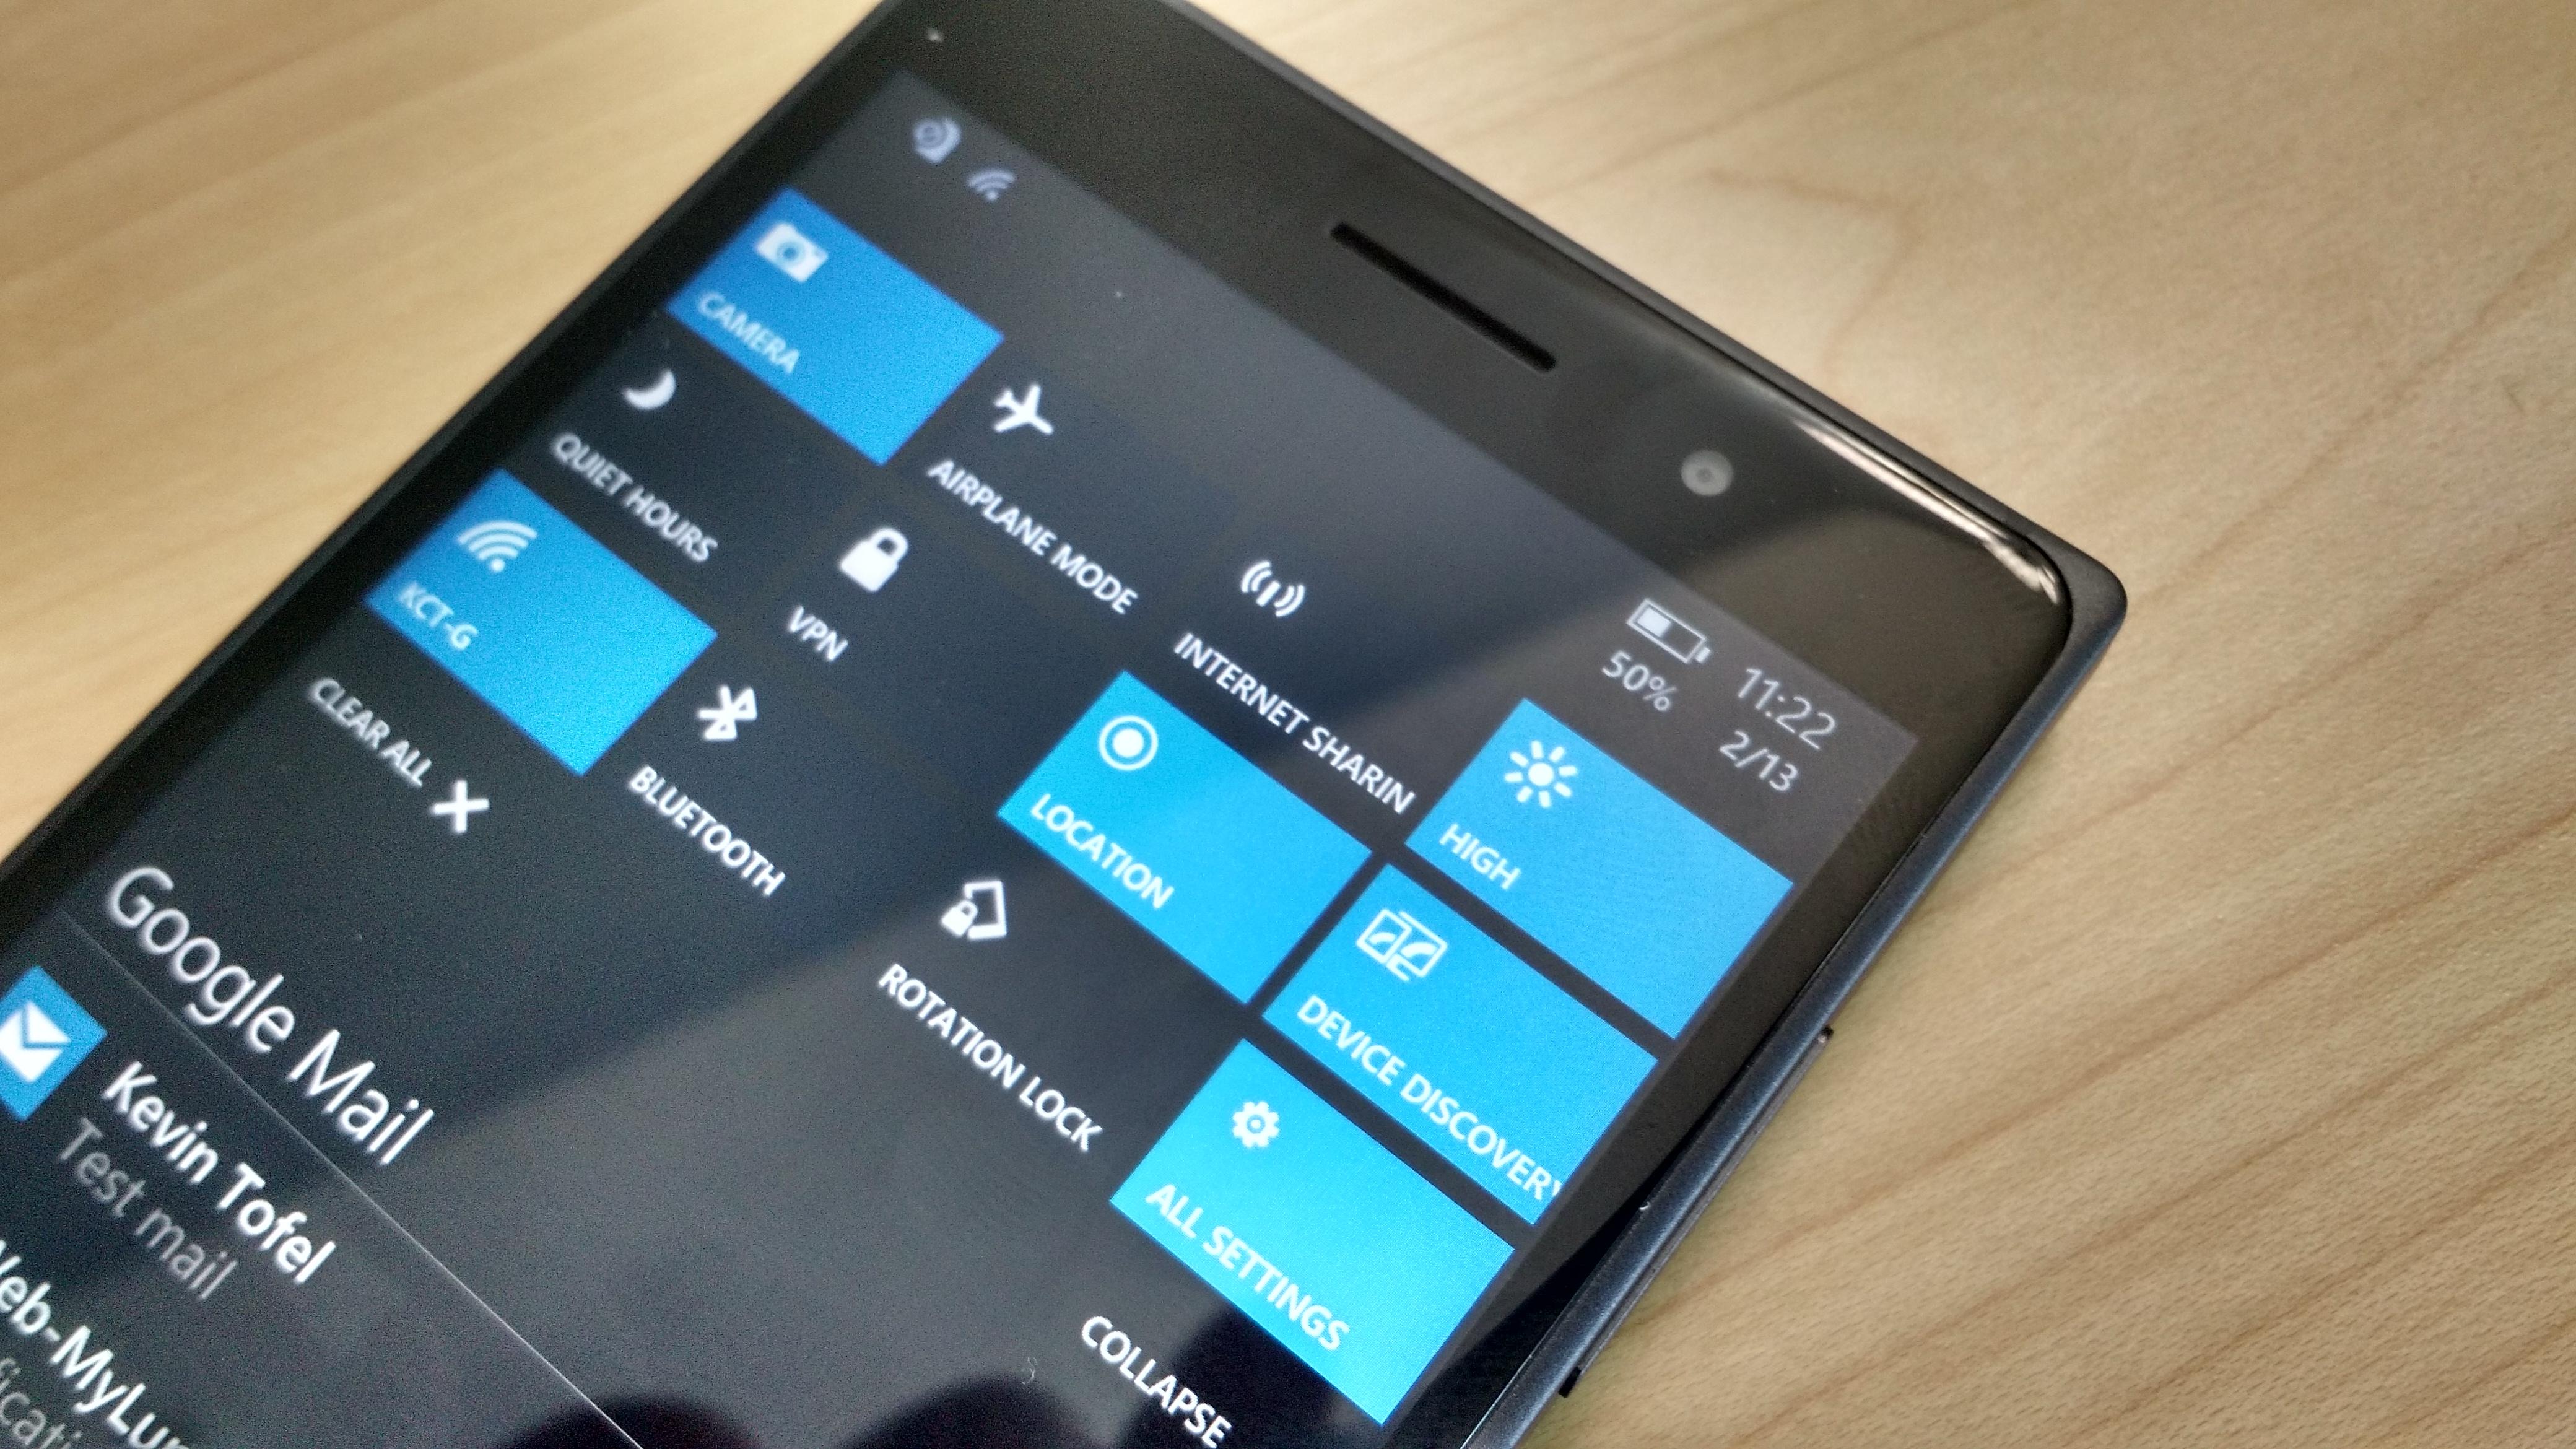 Windows 10 settings pull down